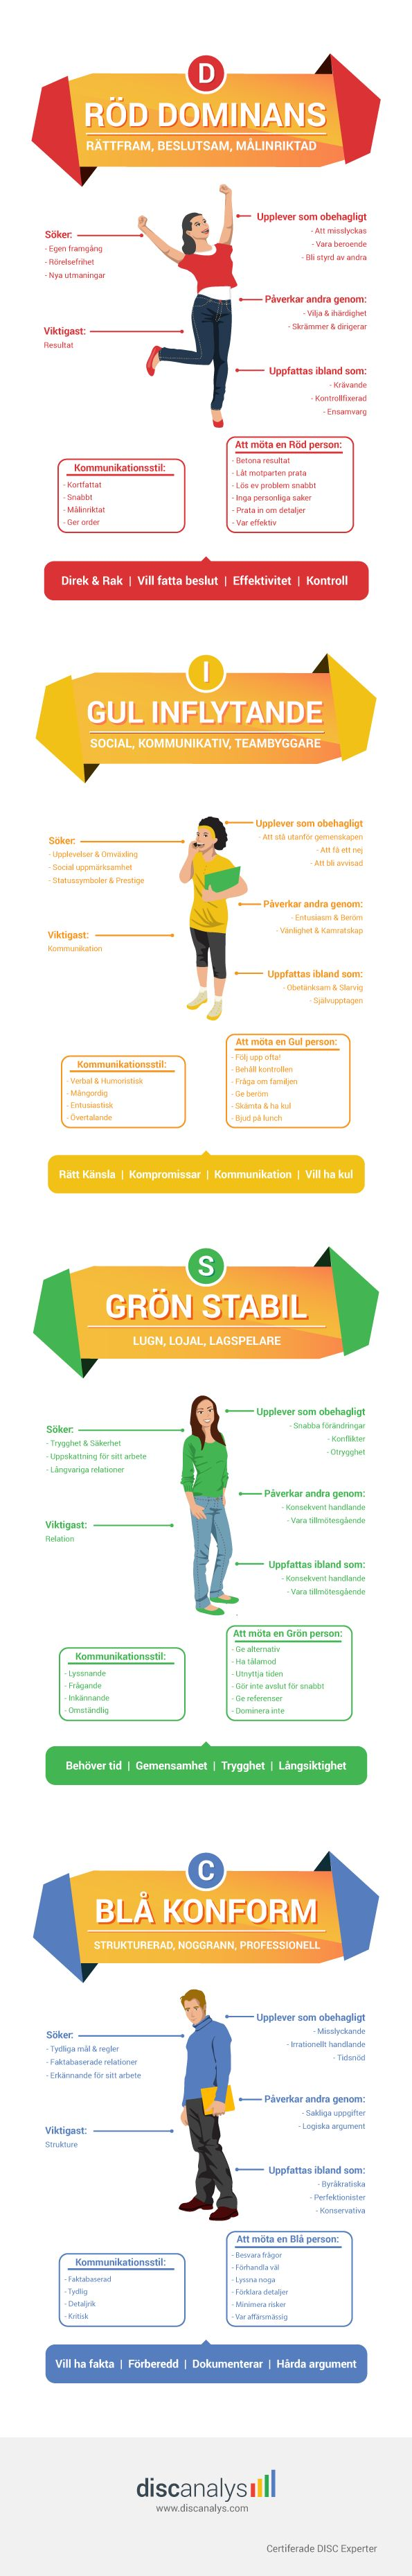 DISC Analys, Röd Gul Grön Blå Person, D I S C Personlighet, DISC Profil, Personlighetstest färger Infographic, Infografik